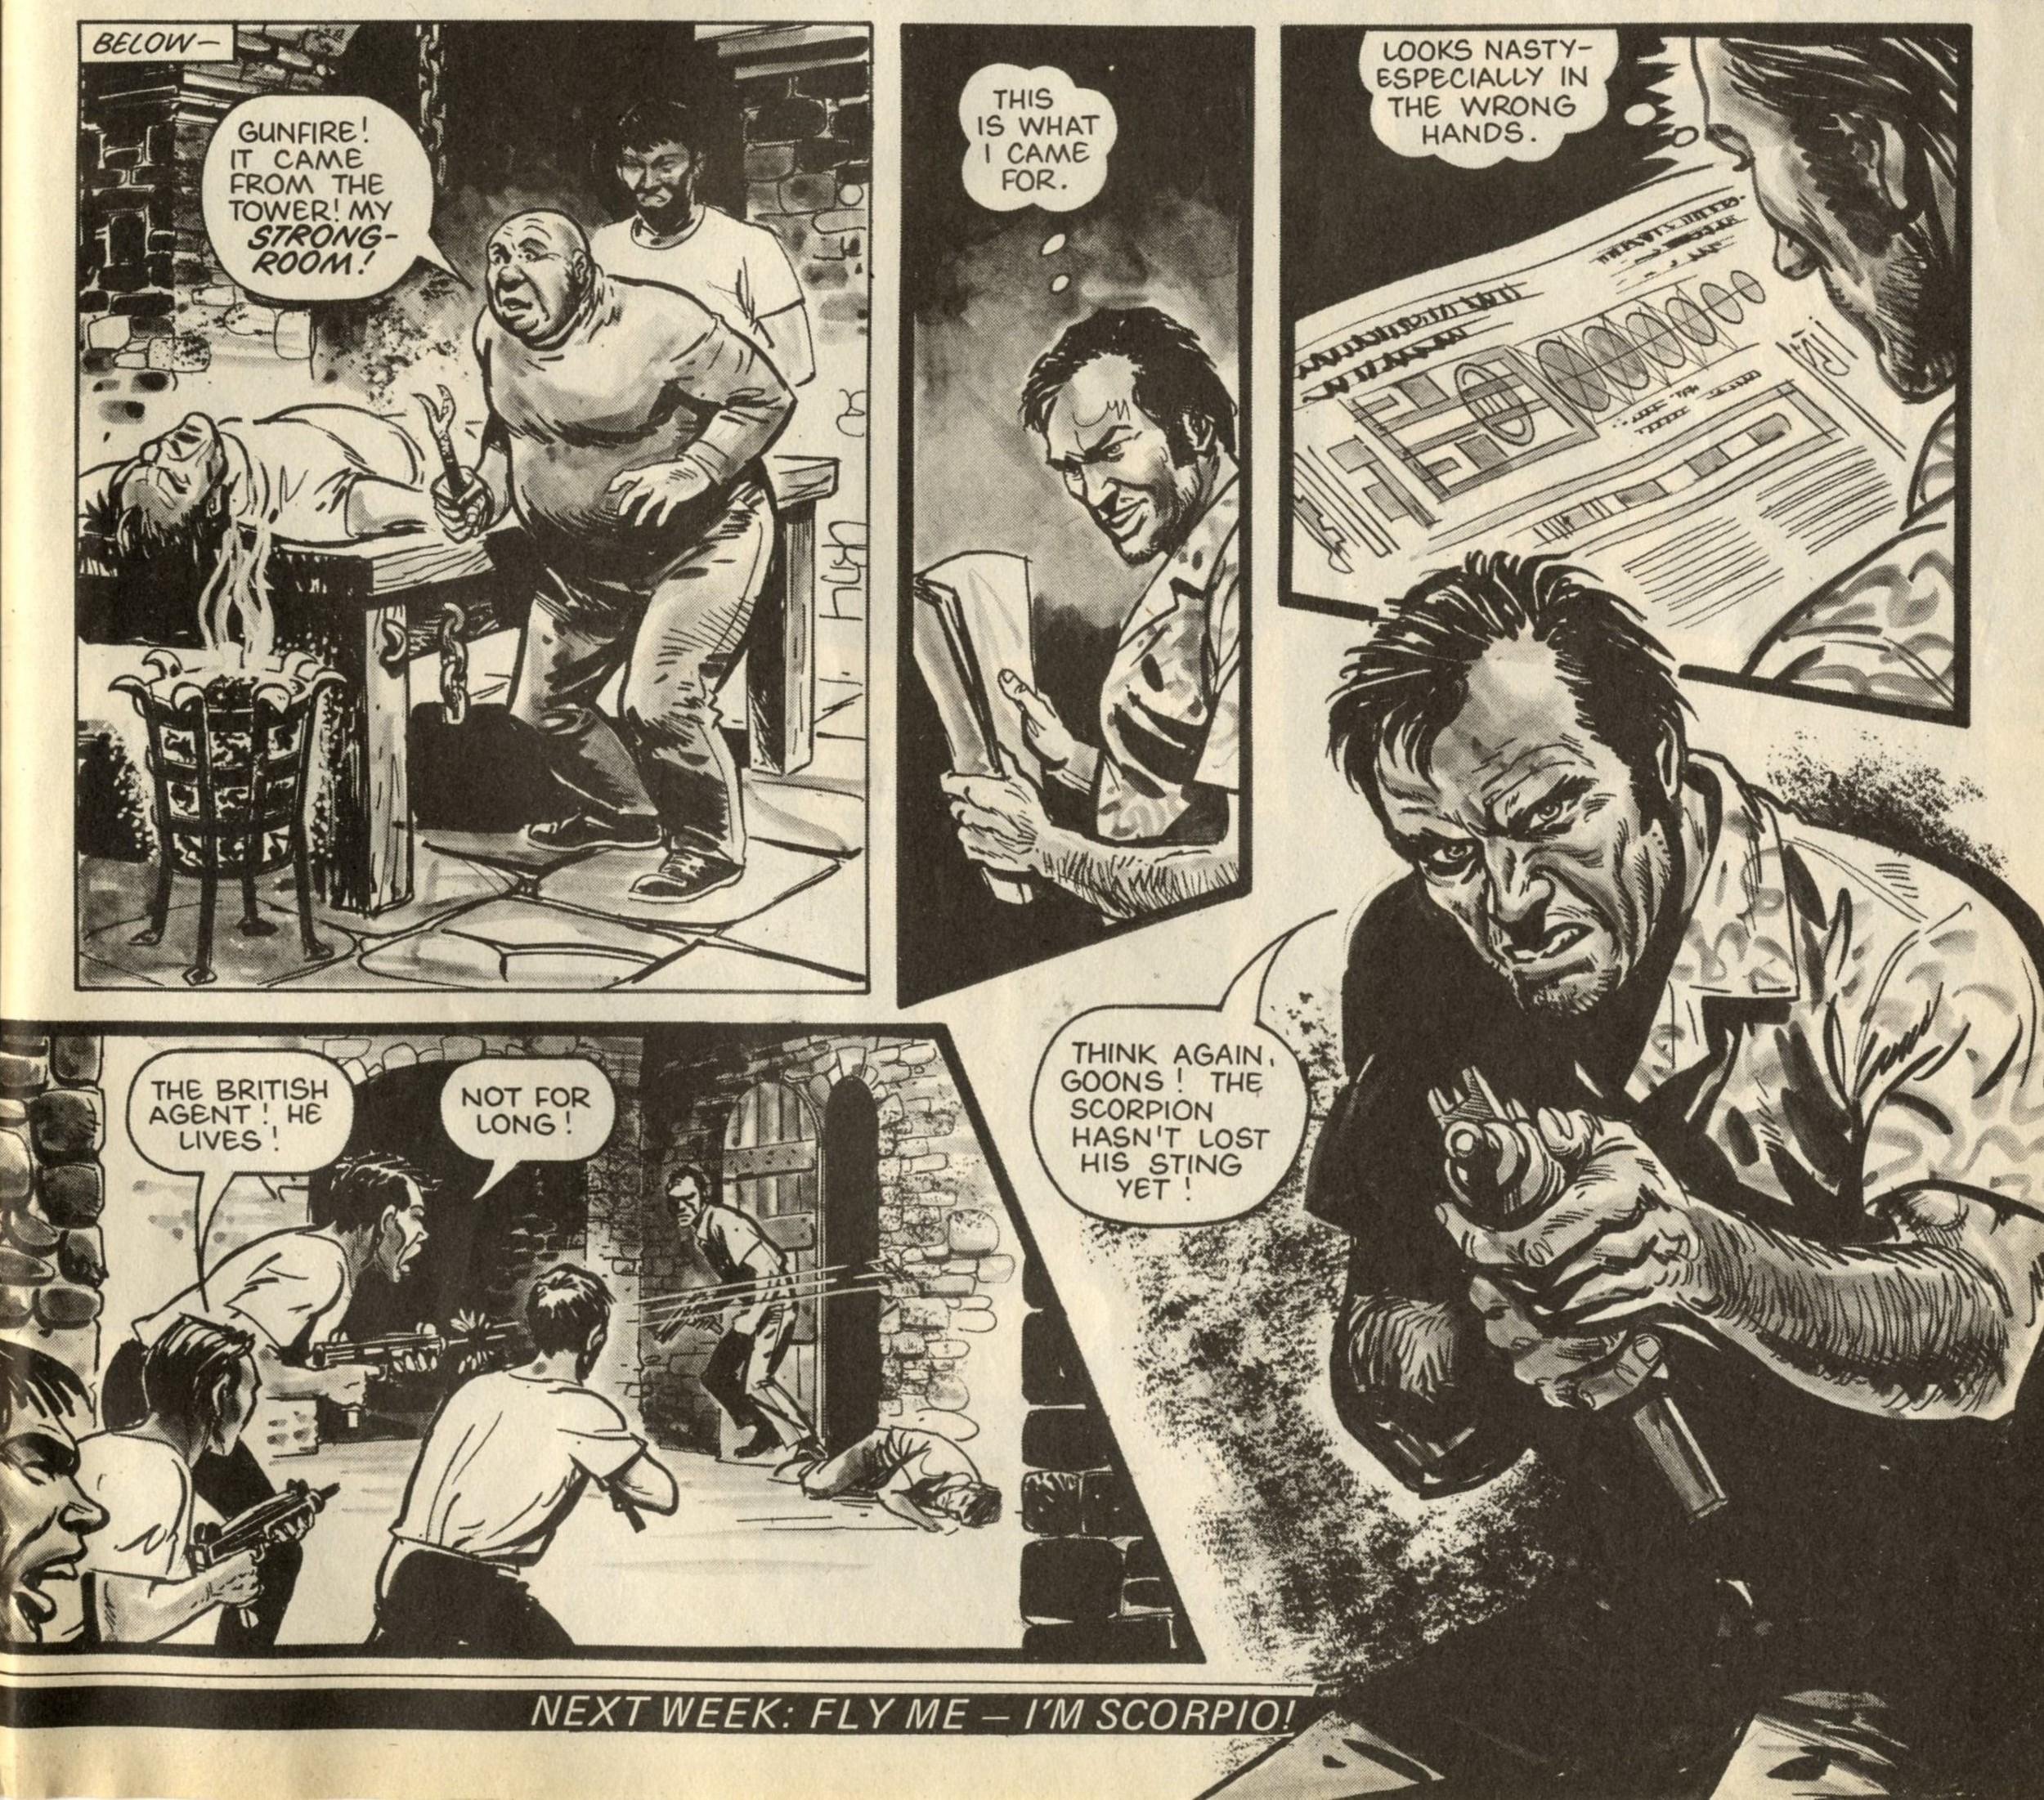 Scorpio: Keith Law (writer), Mike Dorey (artist)